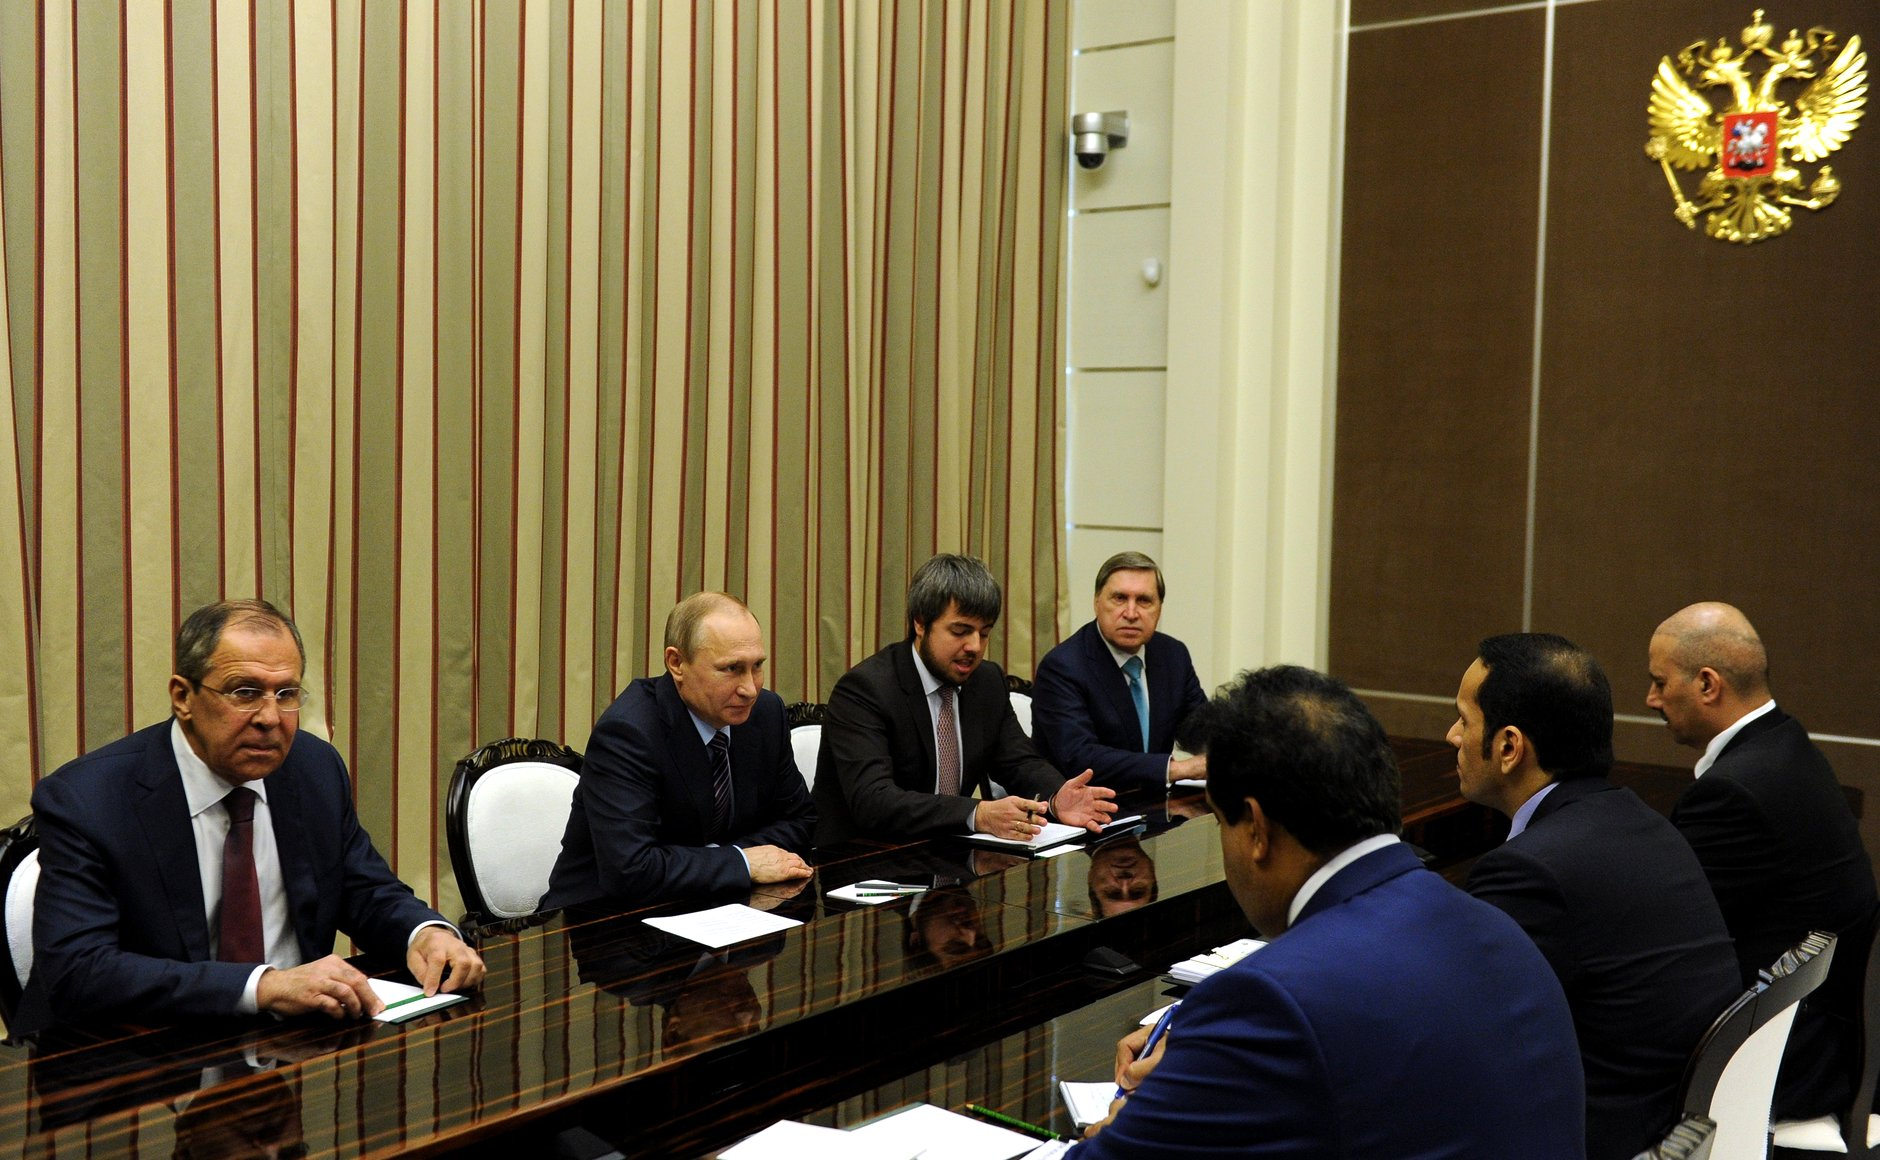 Russian President Vladimir Putin said at a meeting with Qatari Foreign minister Mohammed al-Thani.